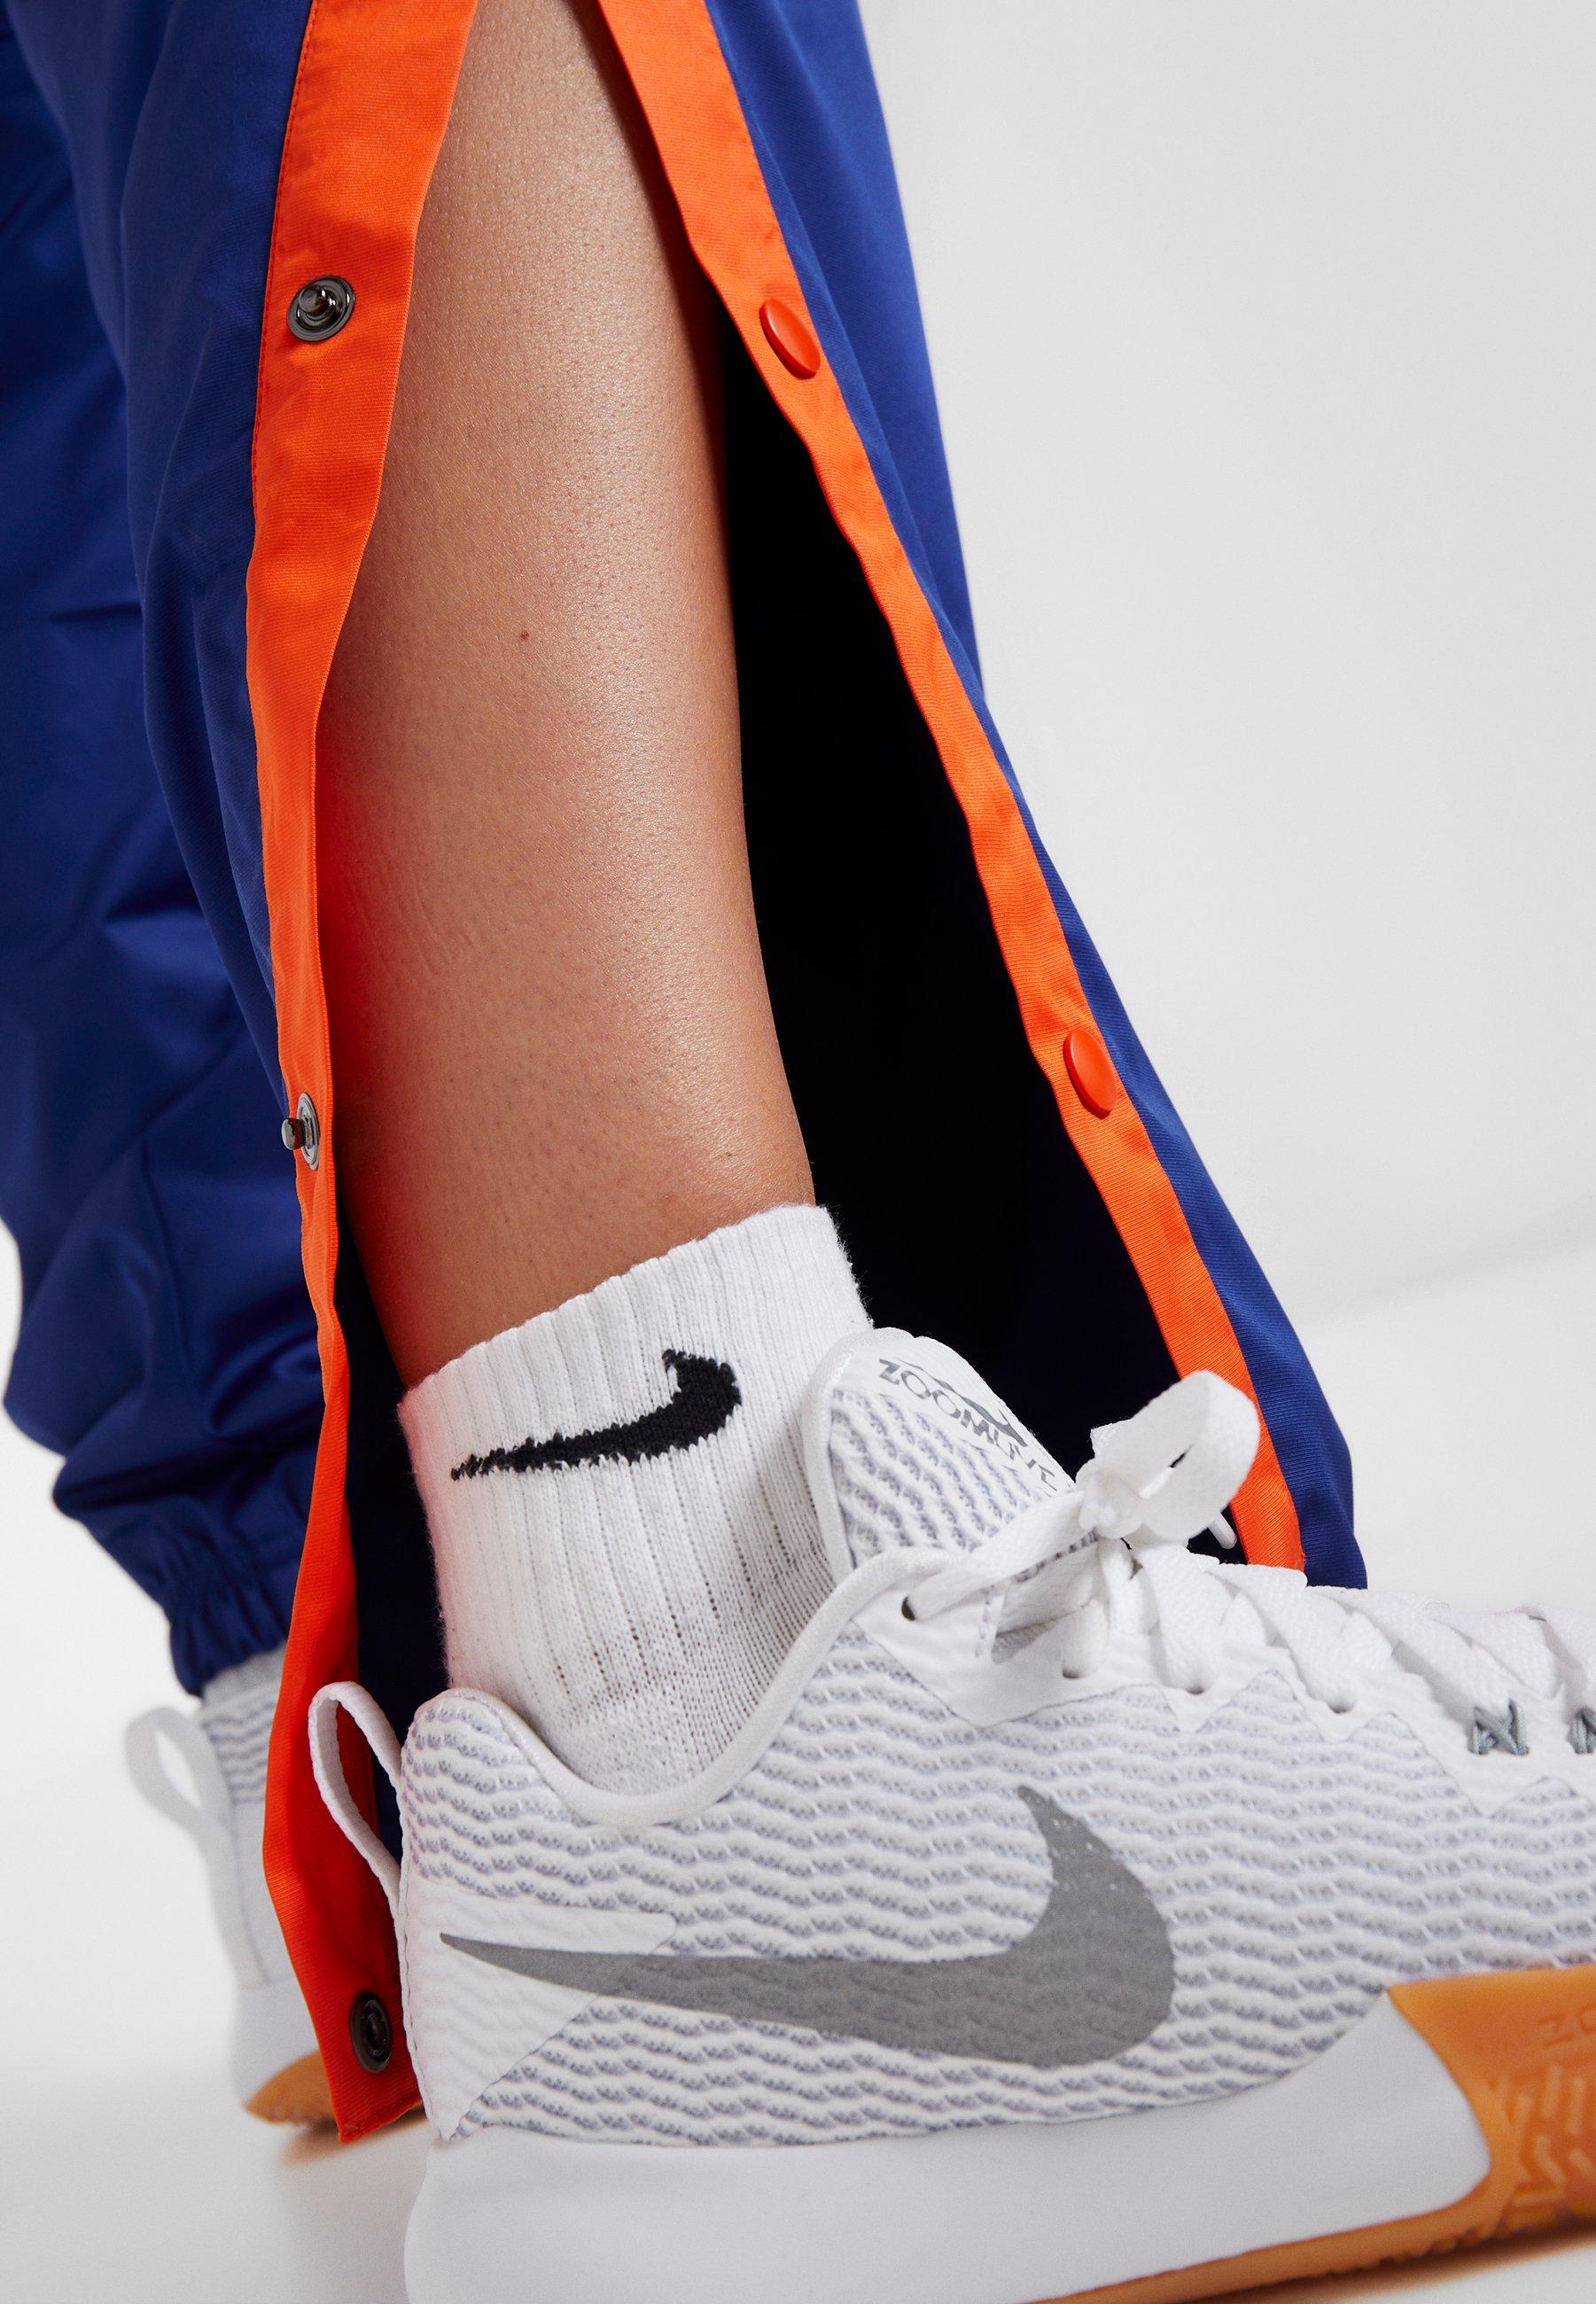 Snap Nike Blue brilliant Nba Rush New Womens Knicks York PantSquadra Ornge Performance 3j5RLq4A